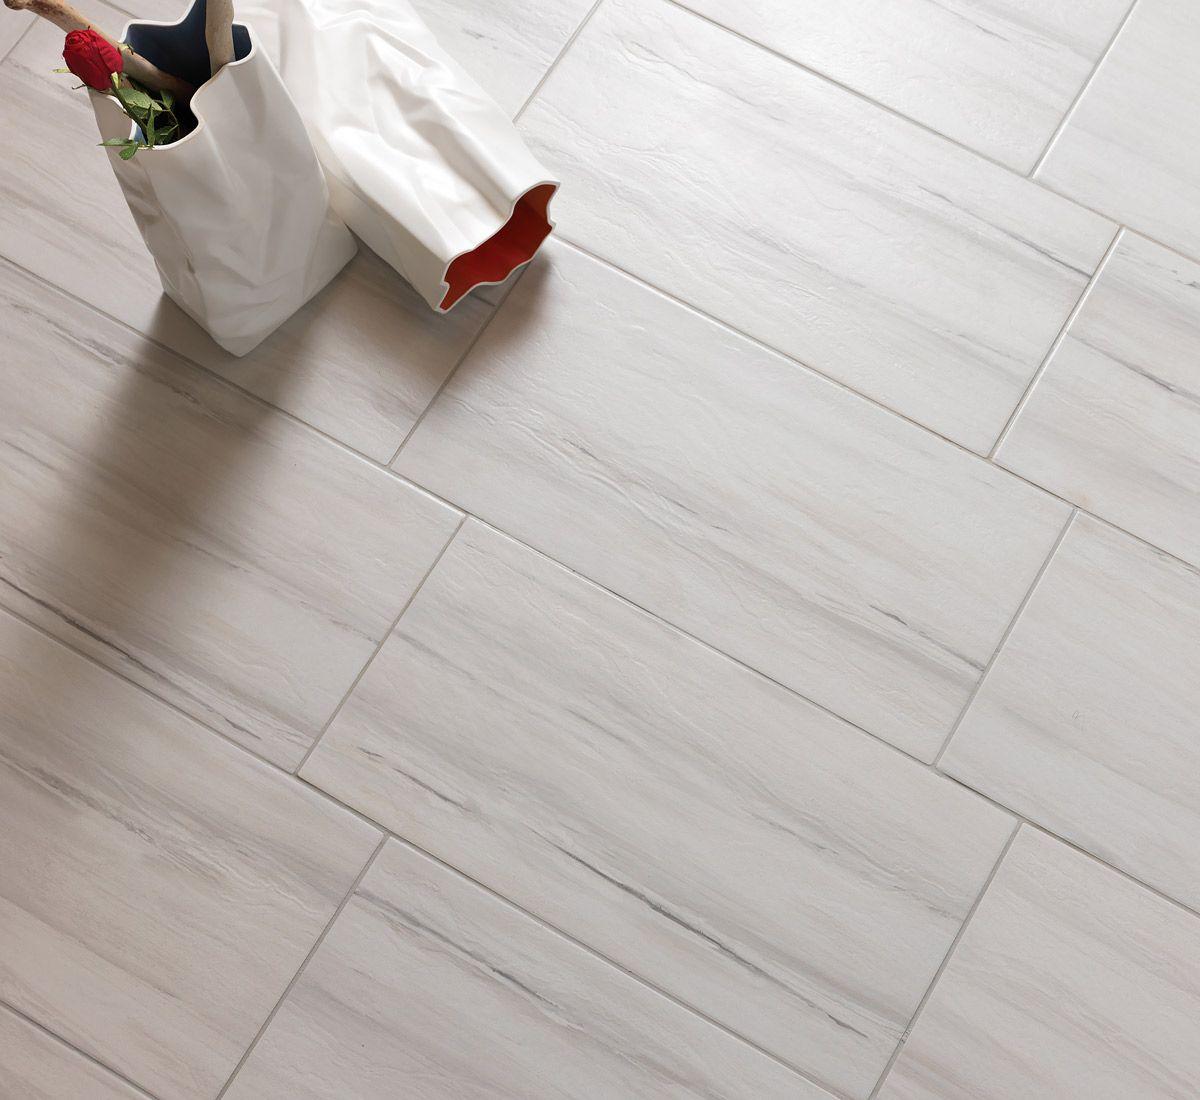 Painted stone series 12x24 white italian porcelain floor tile painted stone series 12x24 white italian porcelain floor tile dailygadgetfo Gallery